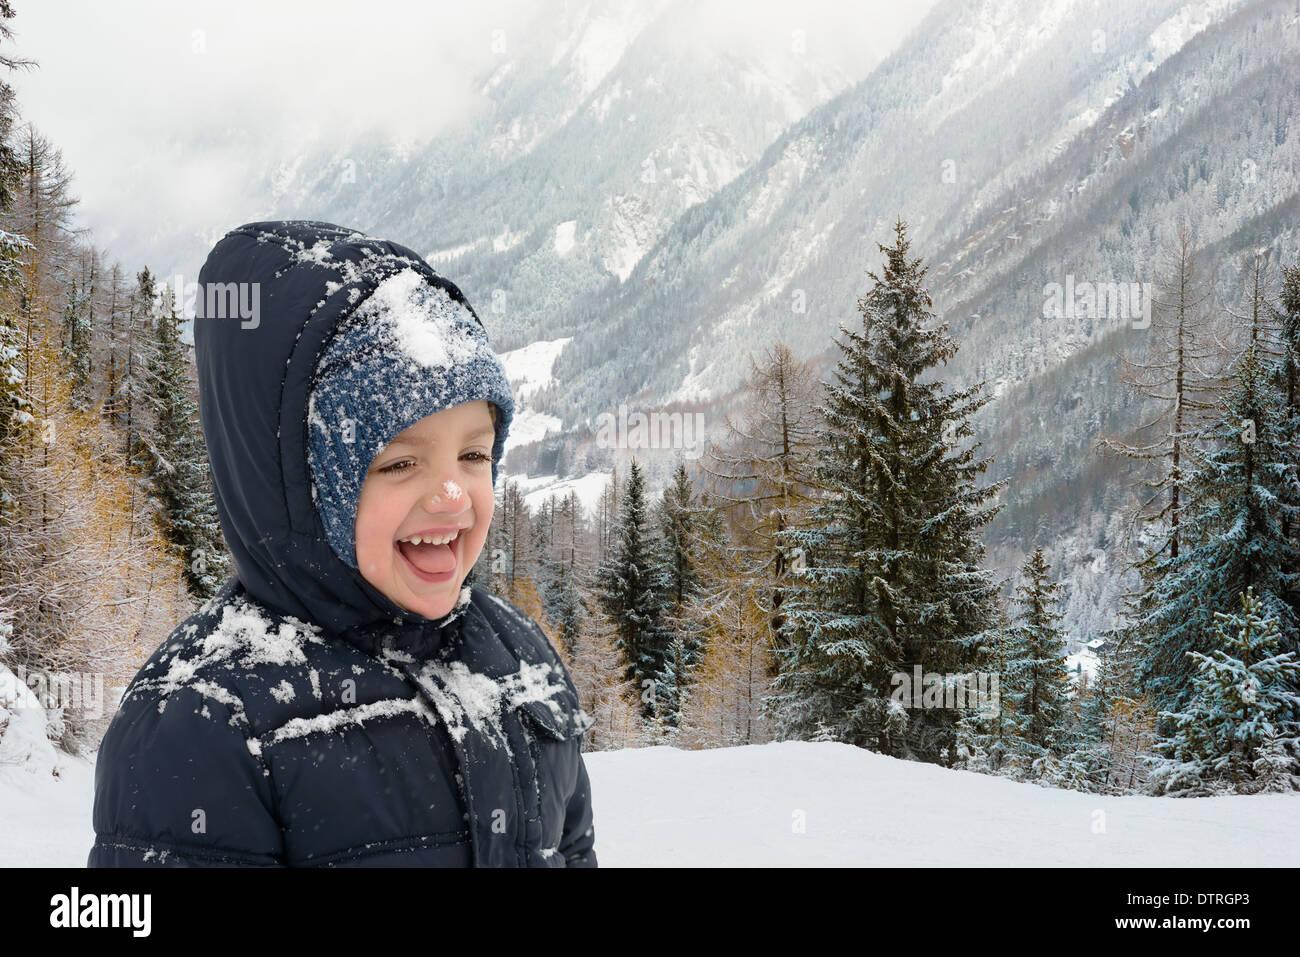 Happy child in wintertime in mountain resort - Stock Image